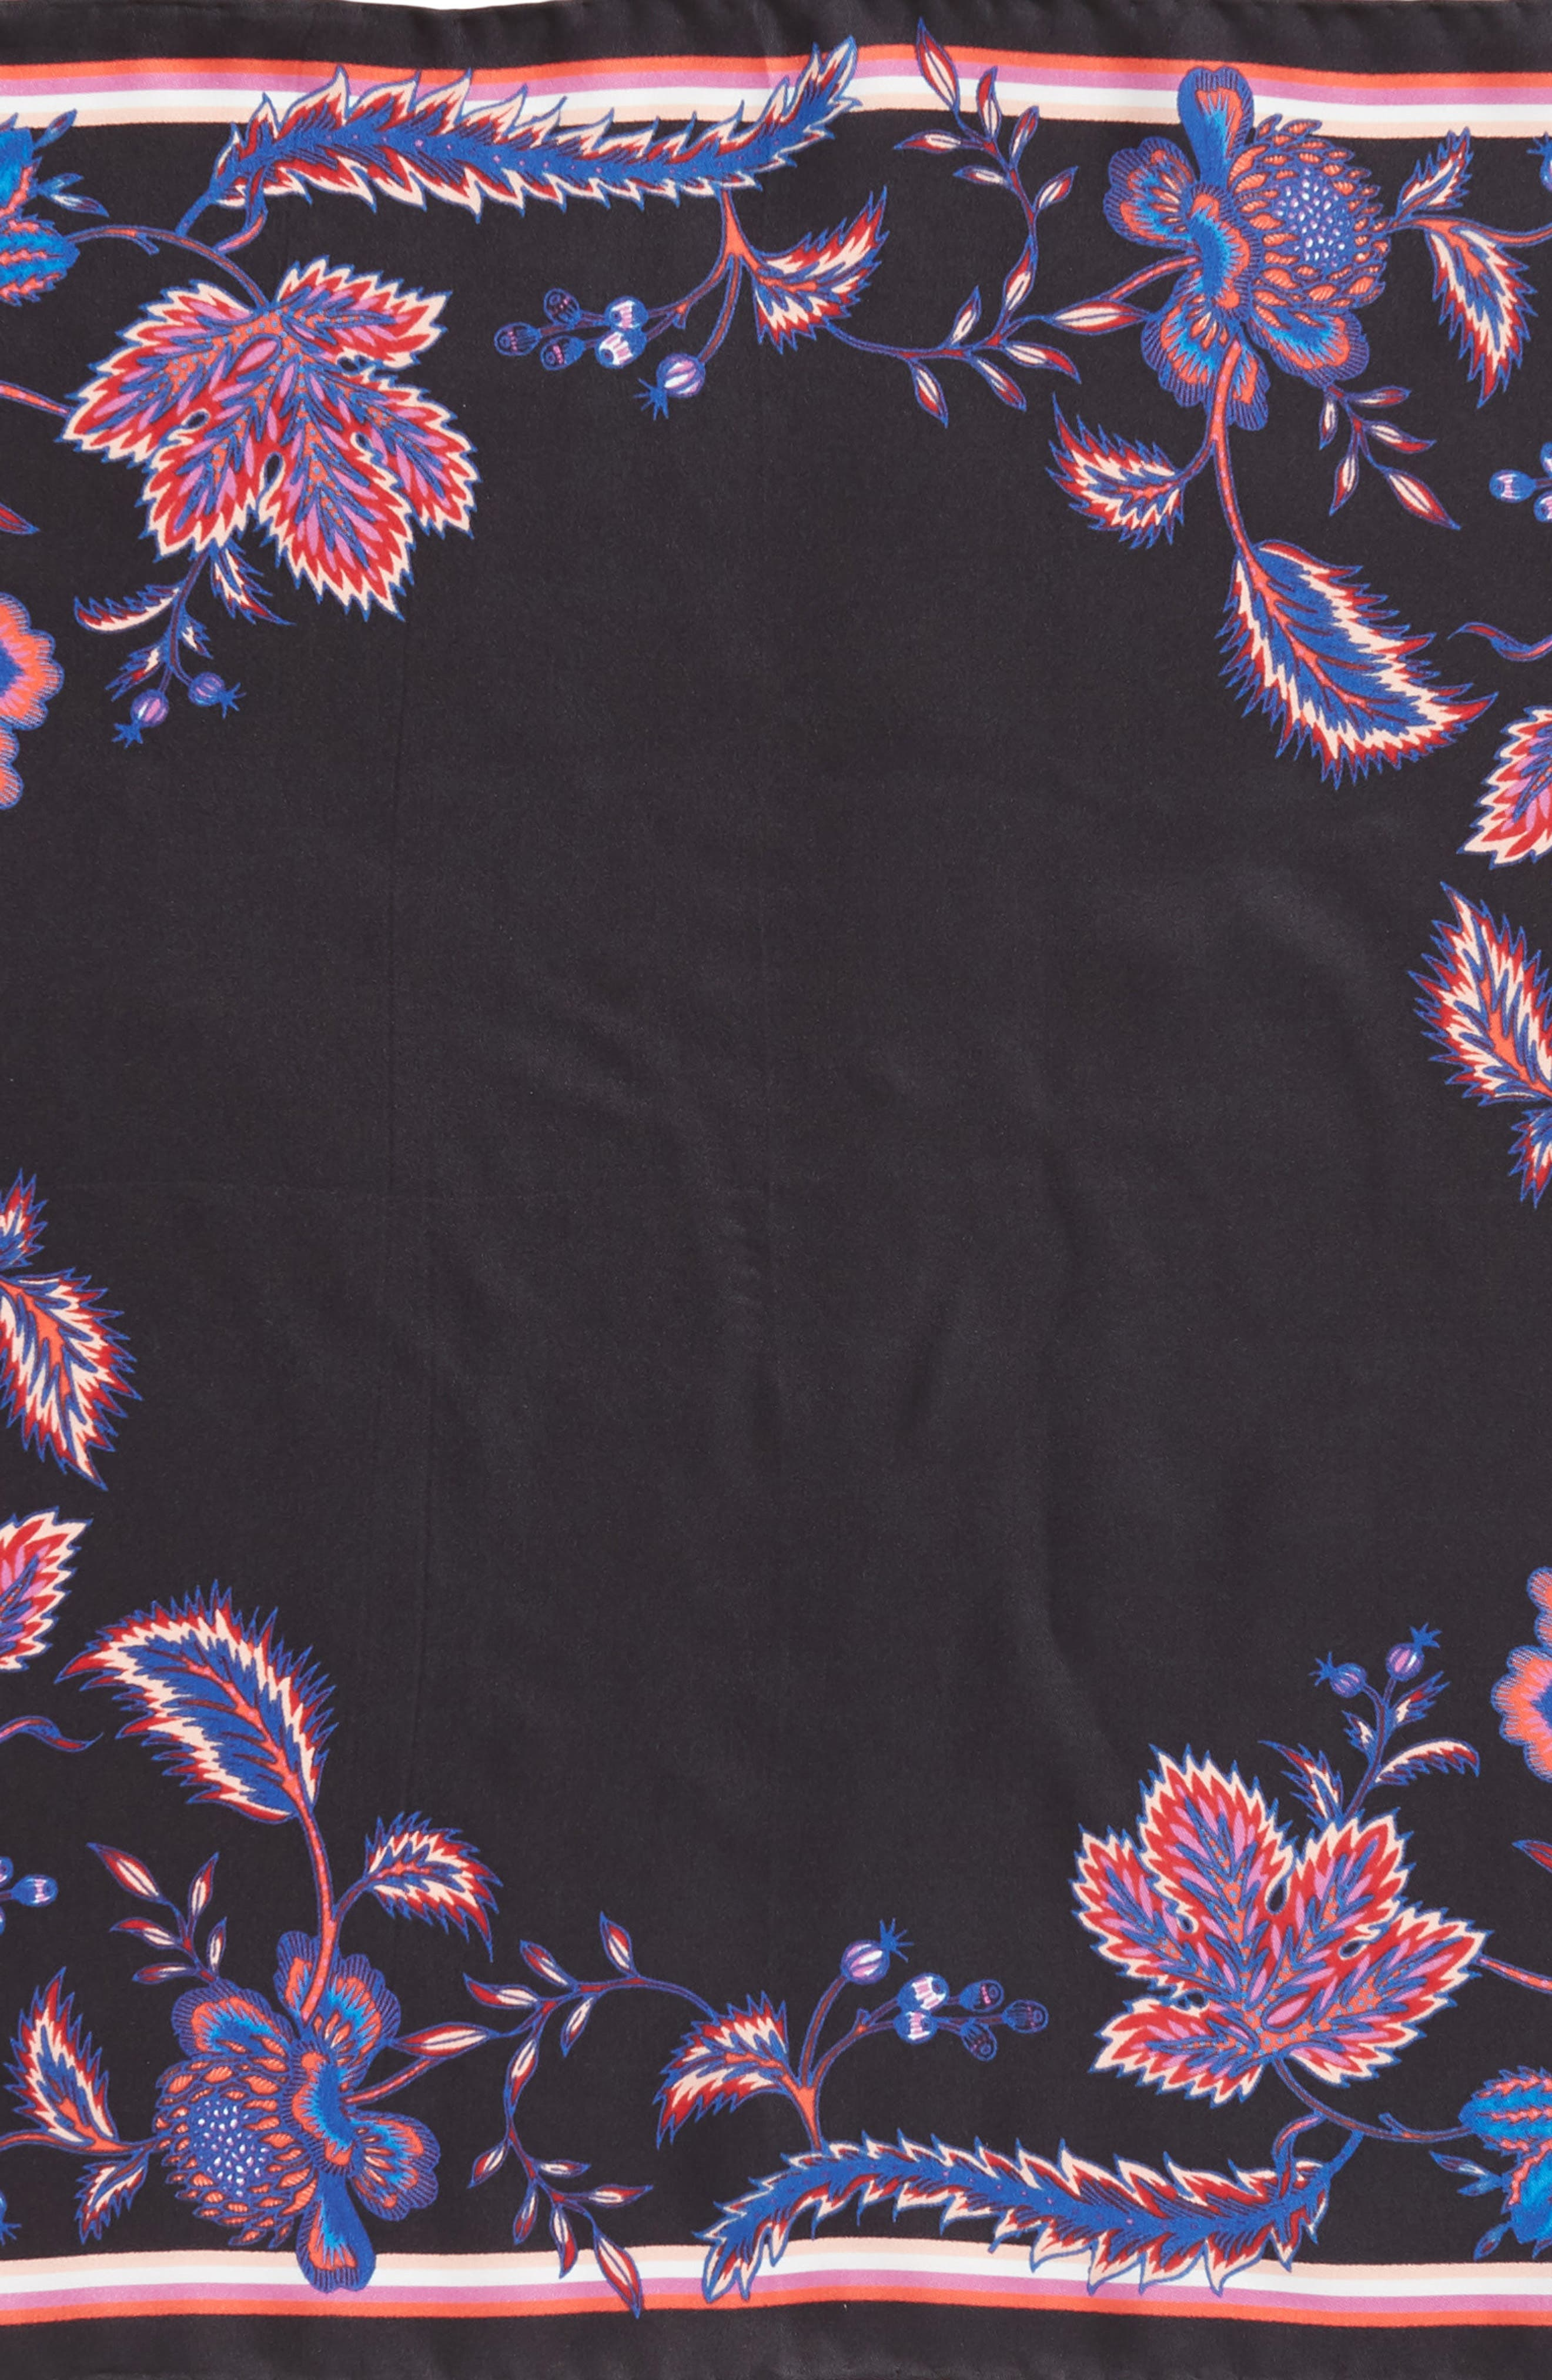 Hypnotic Floral Bandana,                             Alternate thumbnail 4, color,                             BLACK